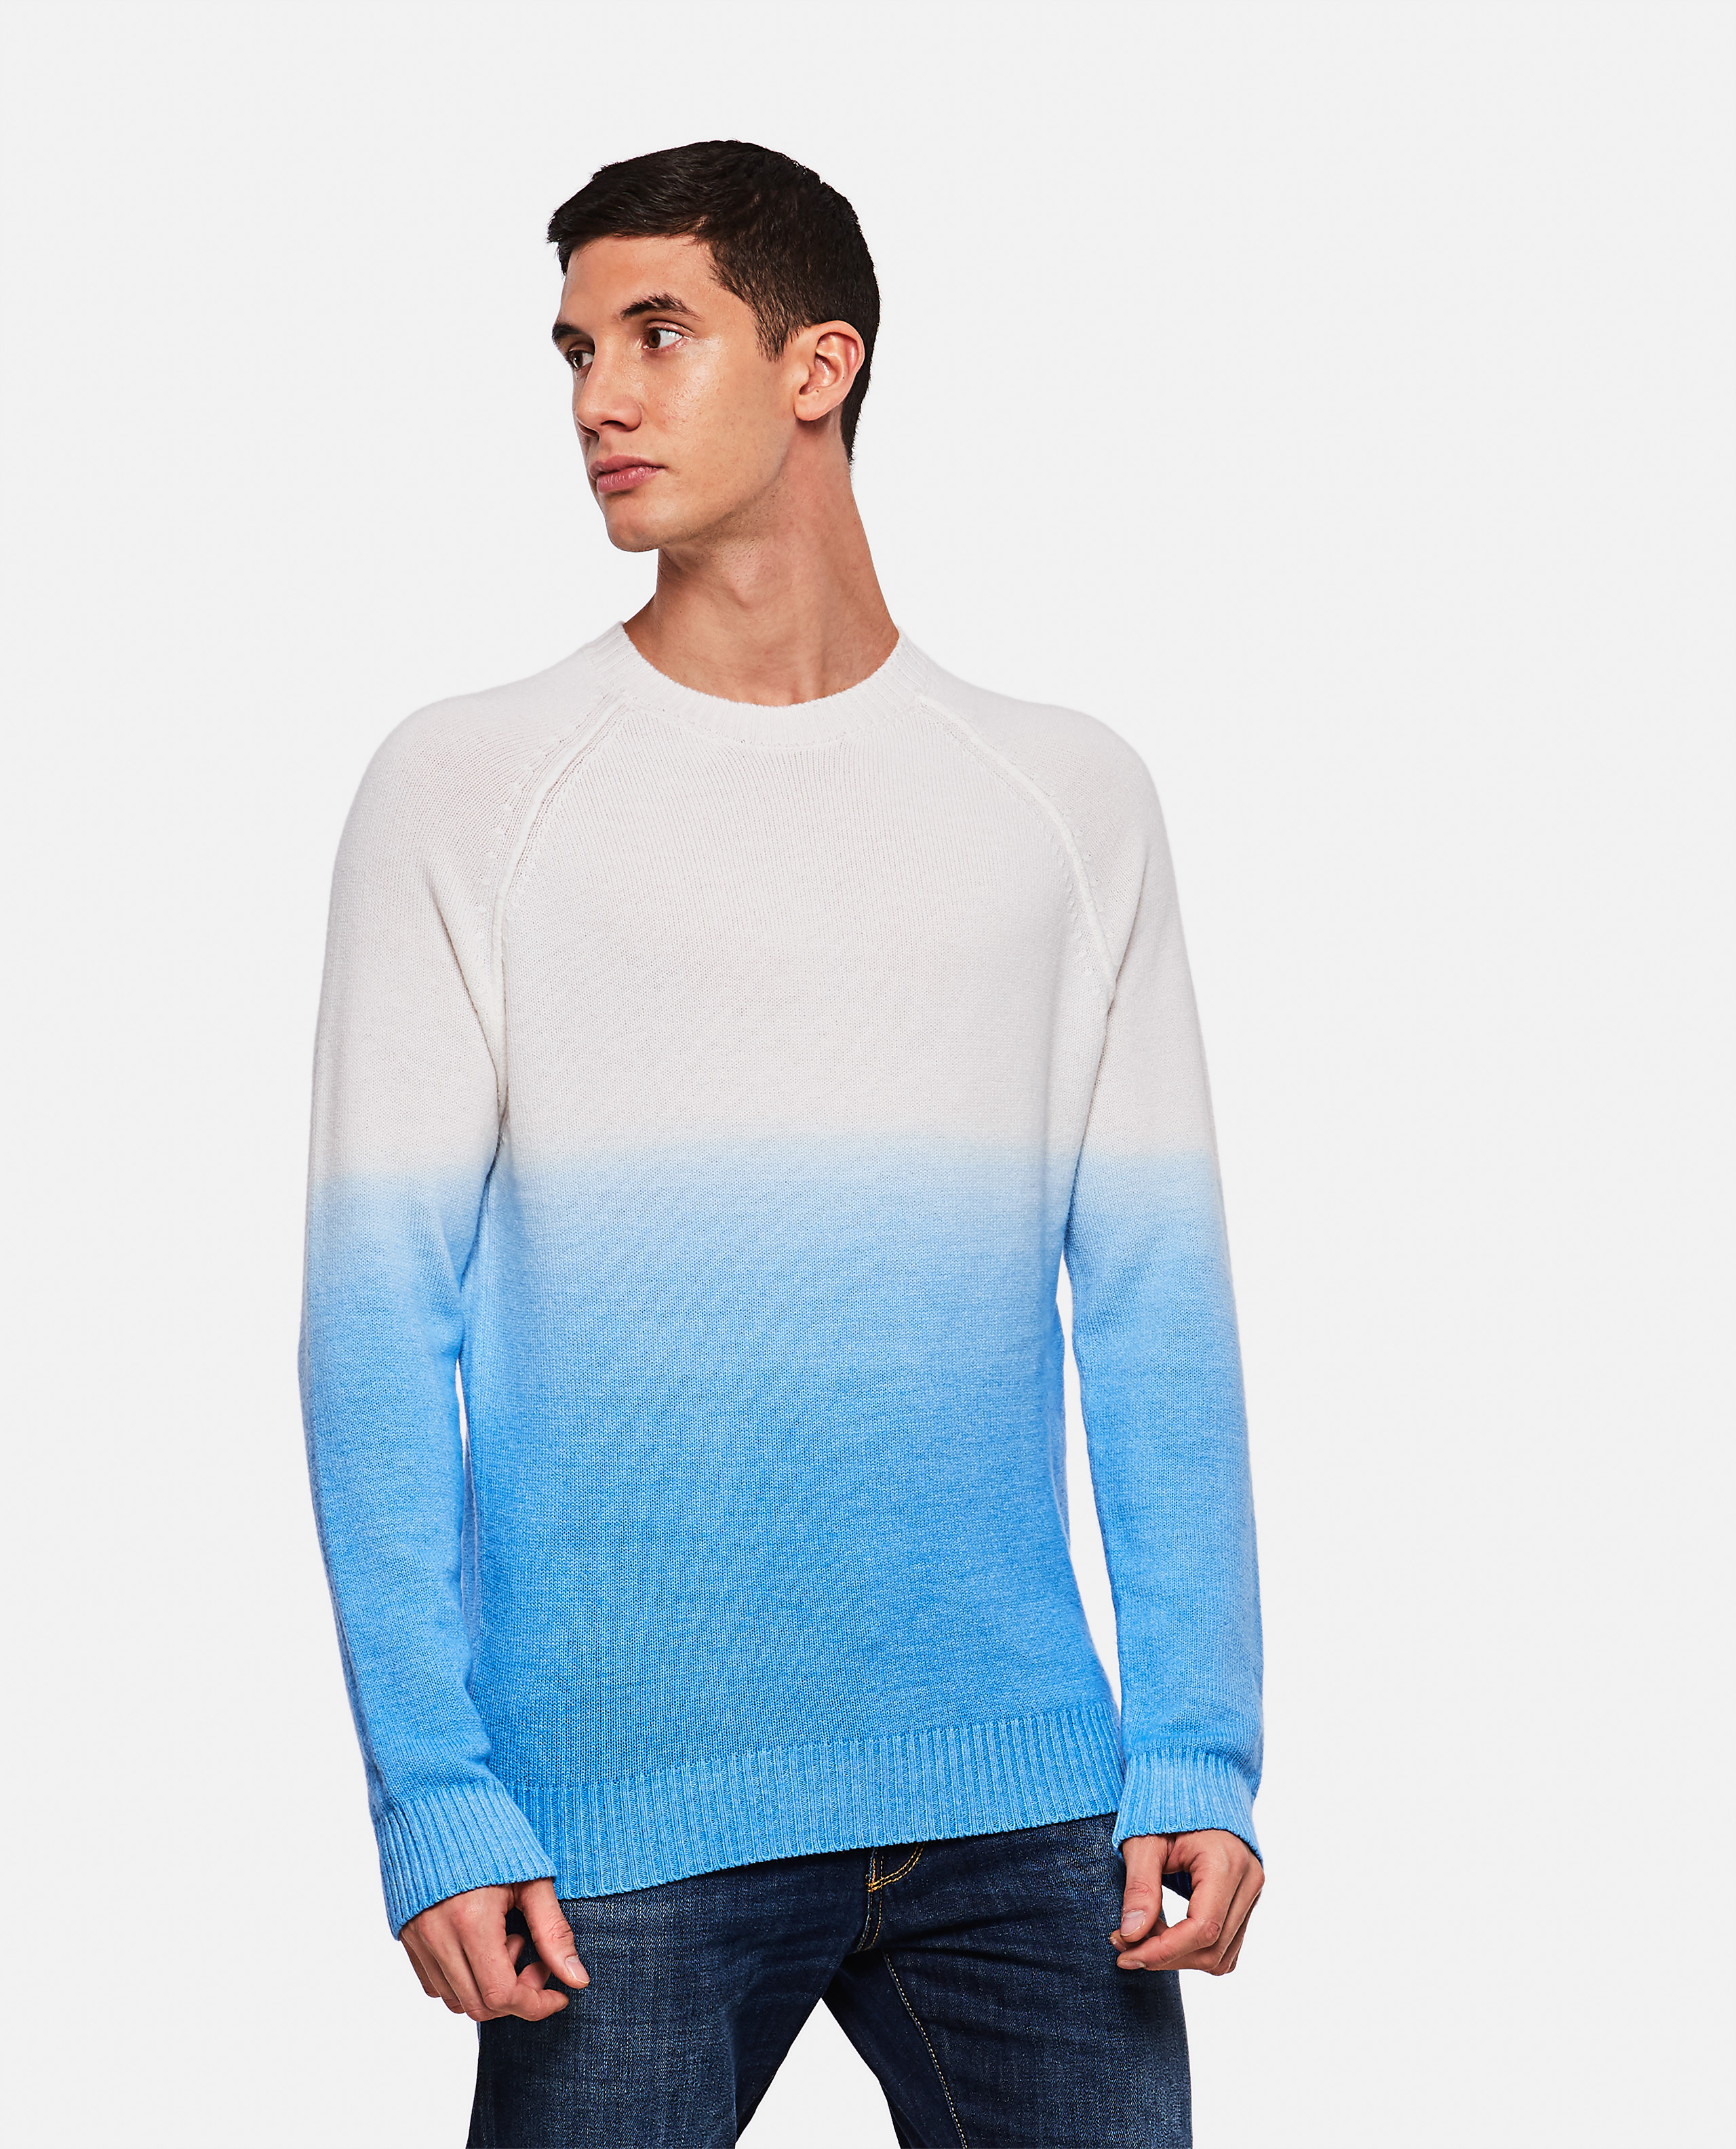 Wafe Life sweater